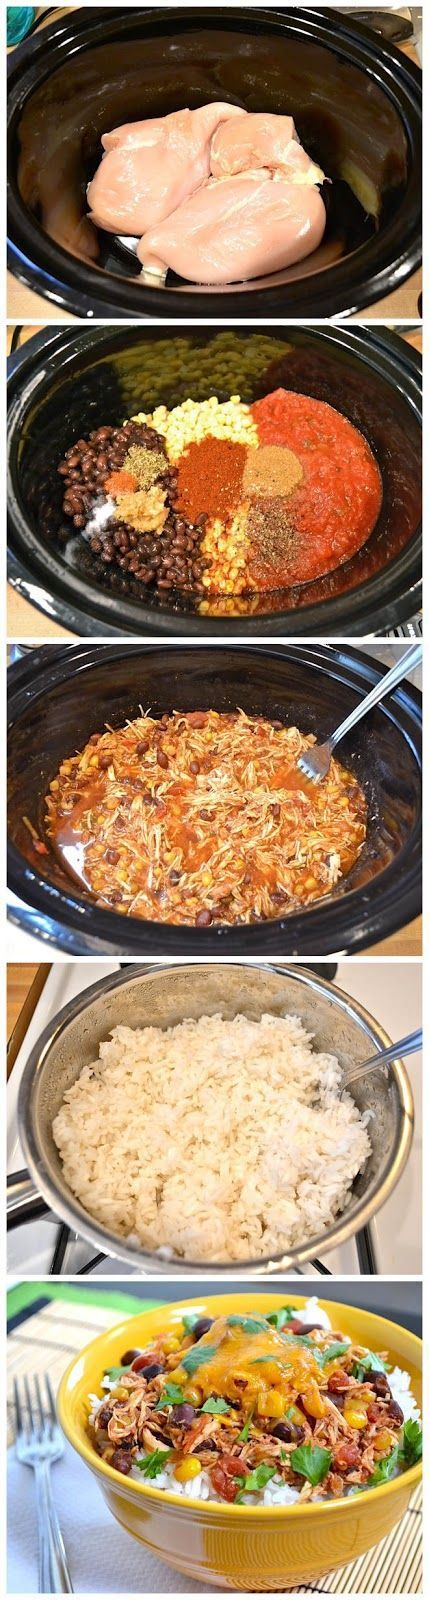 chicken-taco-bowls/